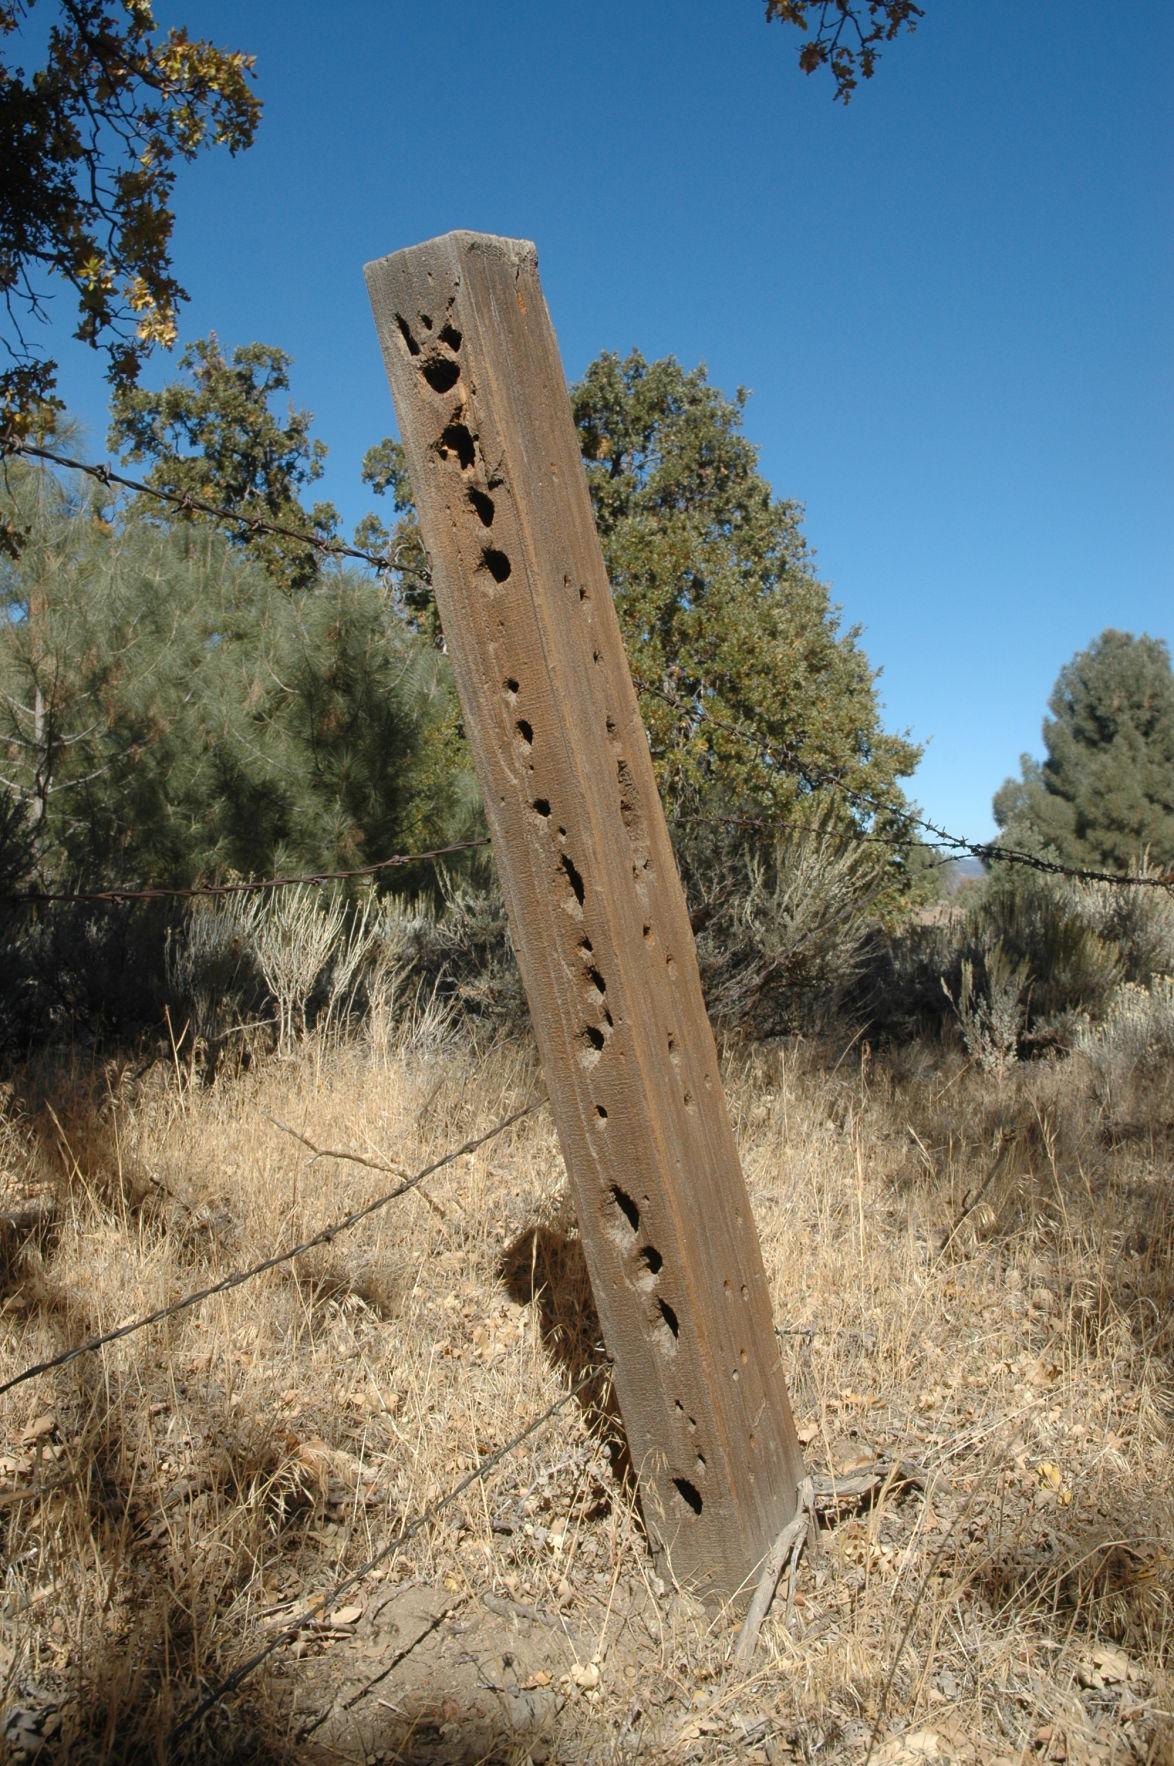 Pen in Hand #1562 - Barbed Wire 1.JPG